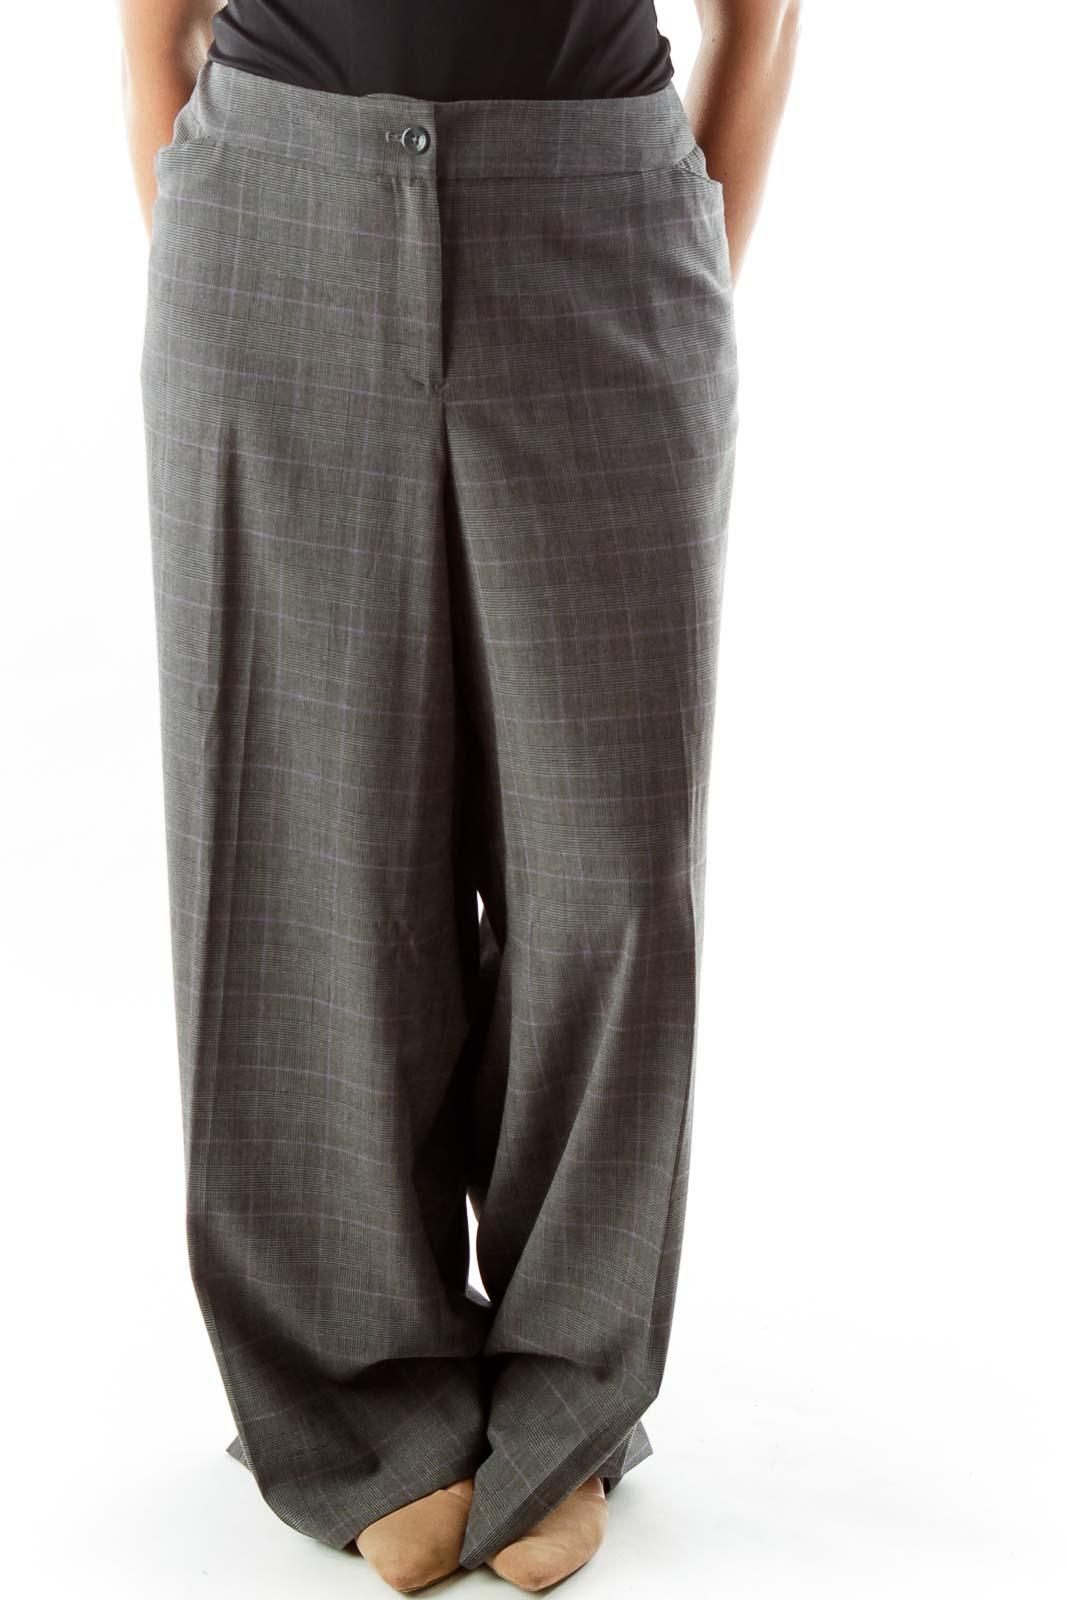 Grey Purple Houndstooth Tartan Suit Pants Front